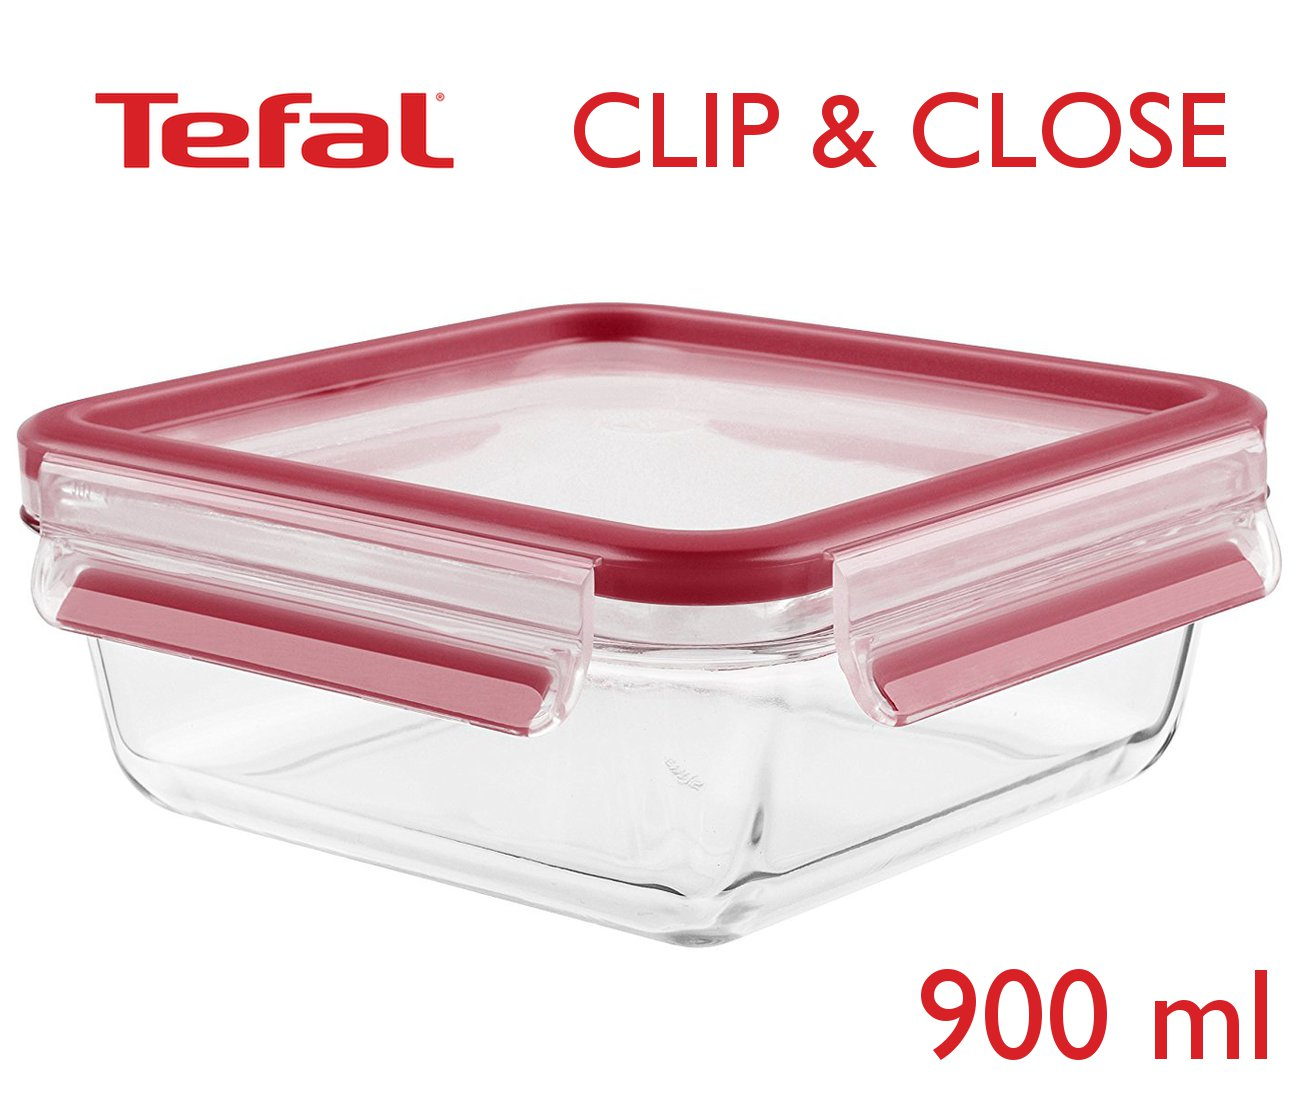 Tefal Clip & Close φαγητοδοχείο γυάλινο 900ml